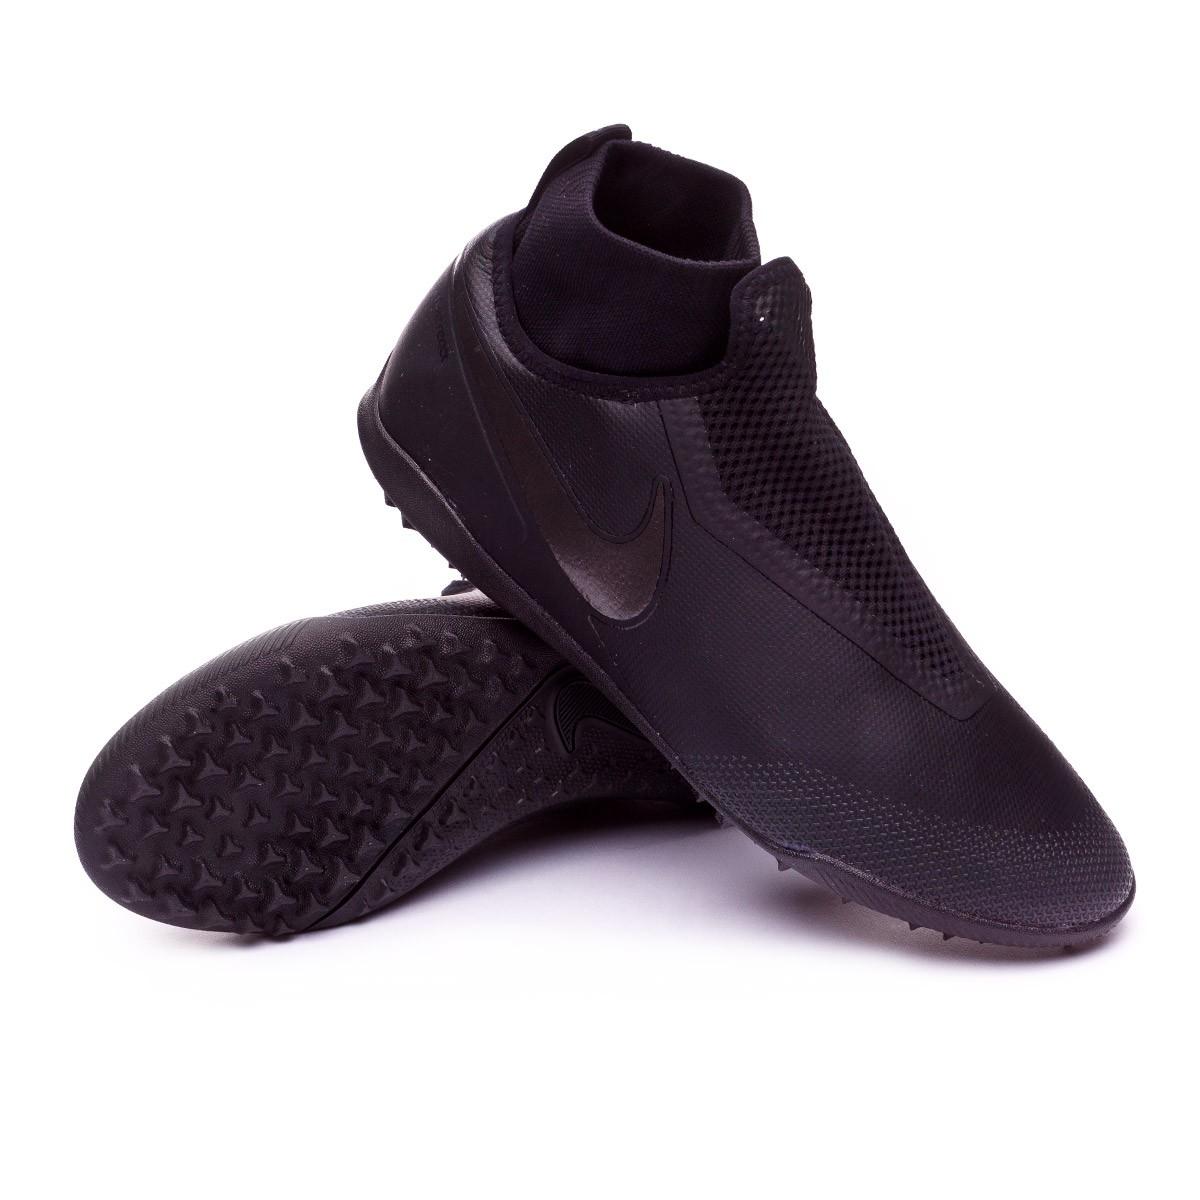 54d5965a11cb Football Boot Nike React Phantom Vision Pro DF Turf Black-Anthracite ...